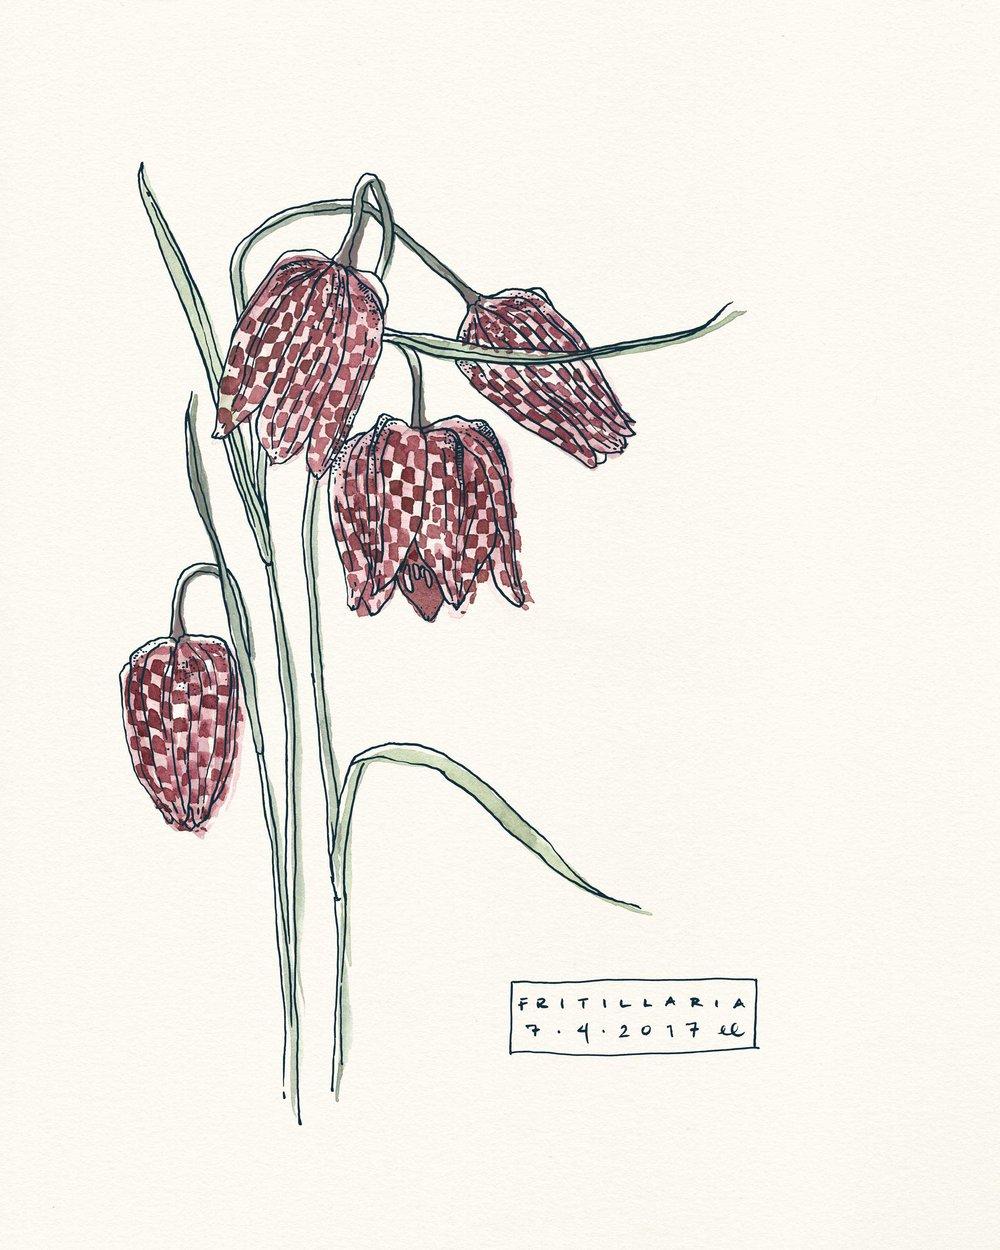 Fritillaria Botanical Illustration